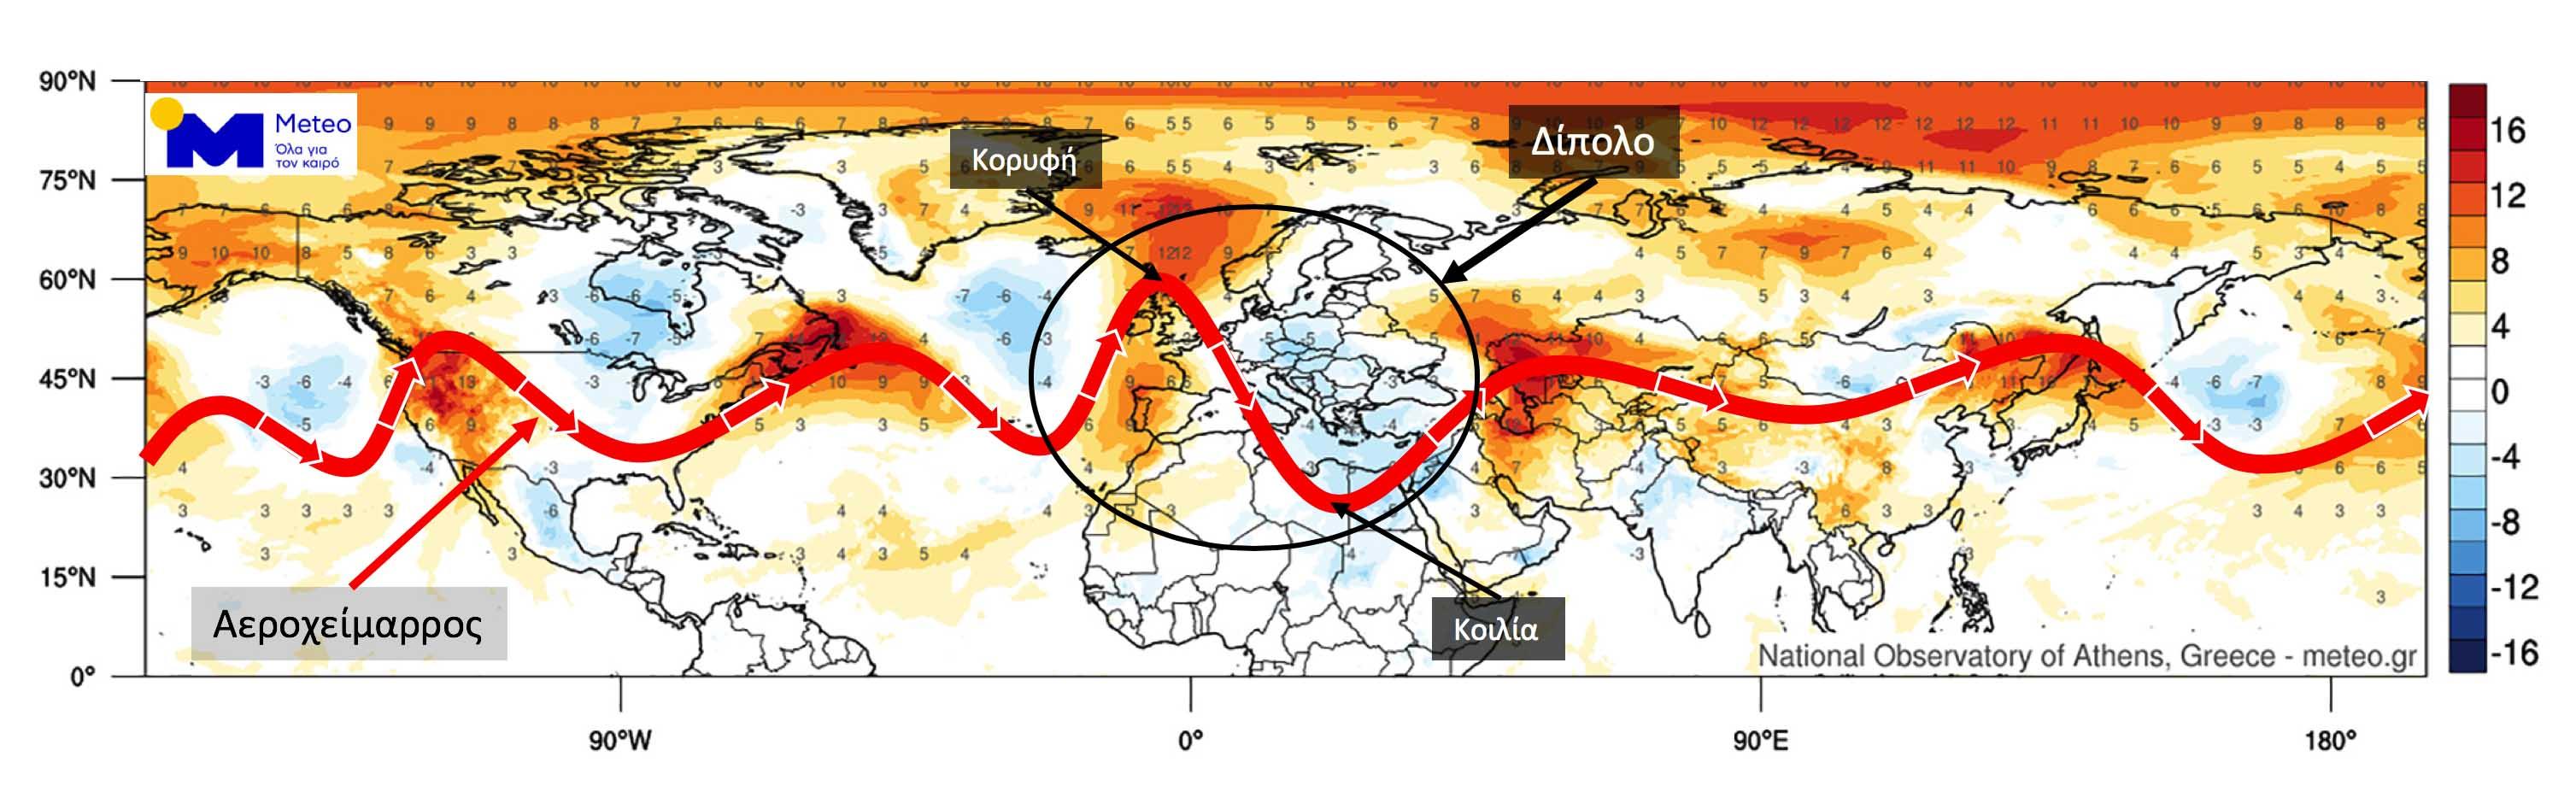 https://www.meteo.gr/UploadedFiles/articlePhotos/MAY20/T850_Anom_052020.jpg